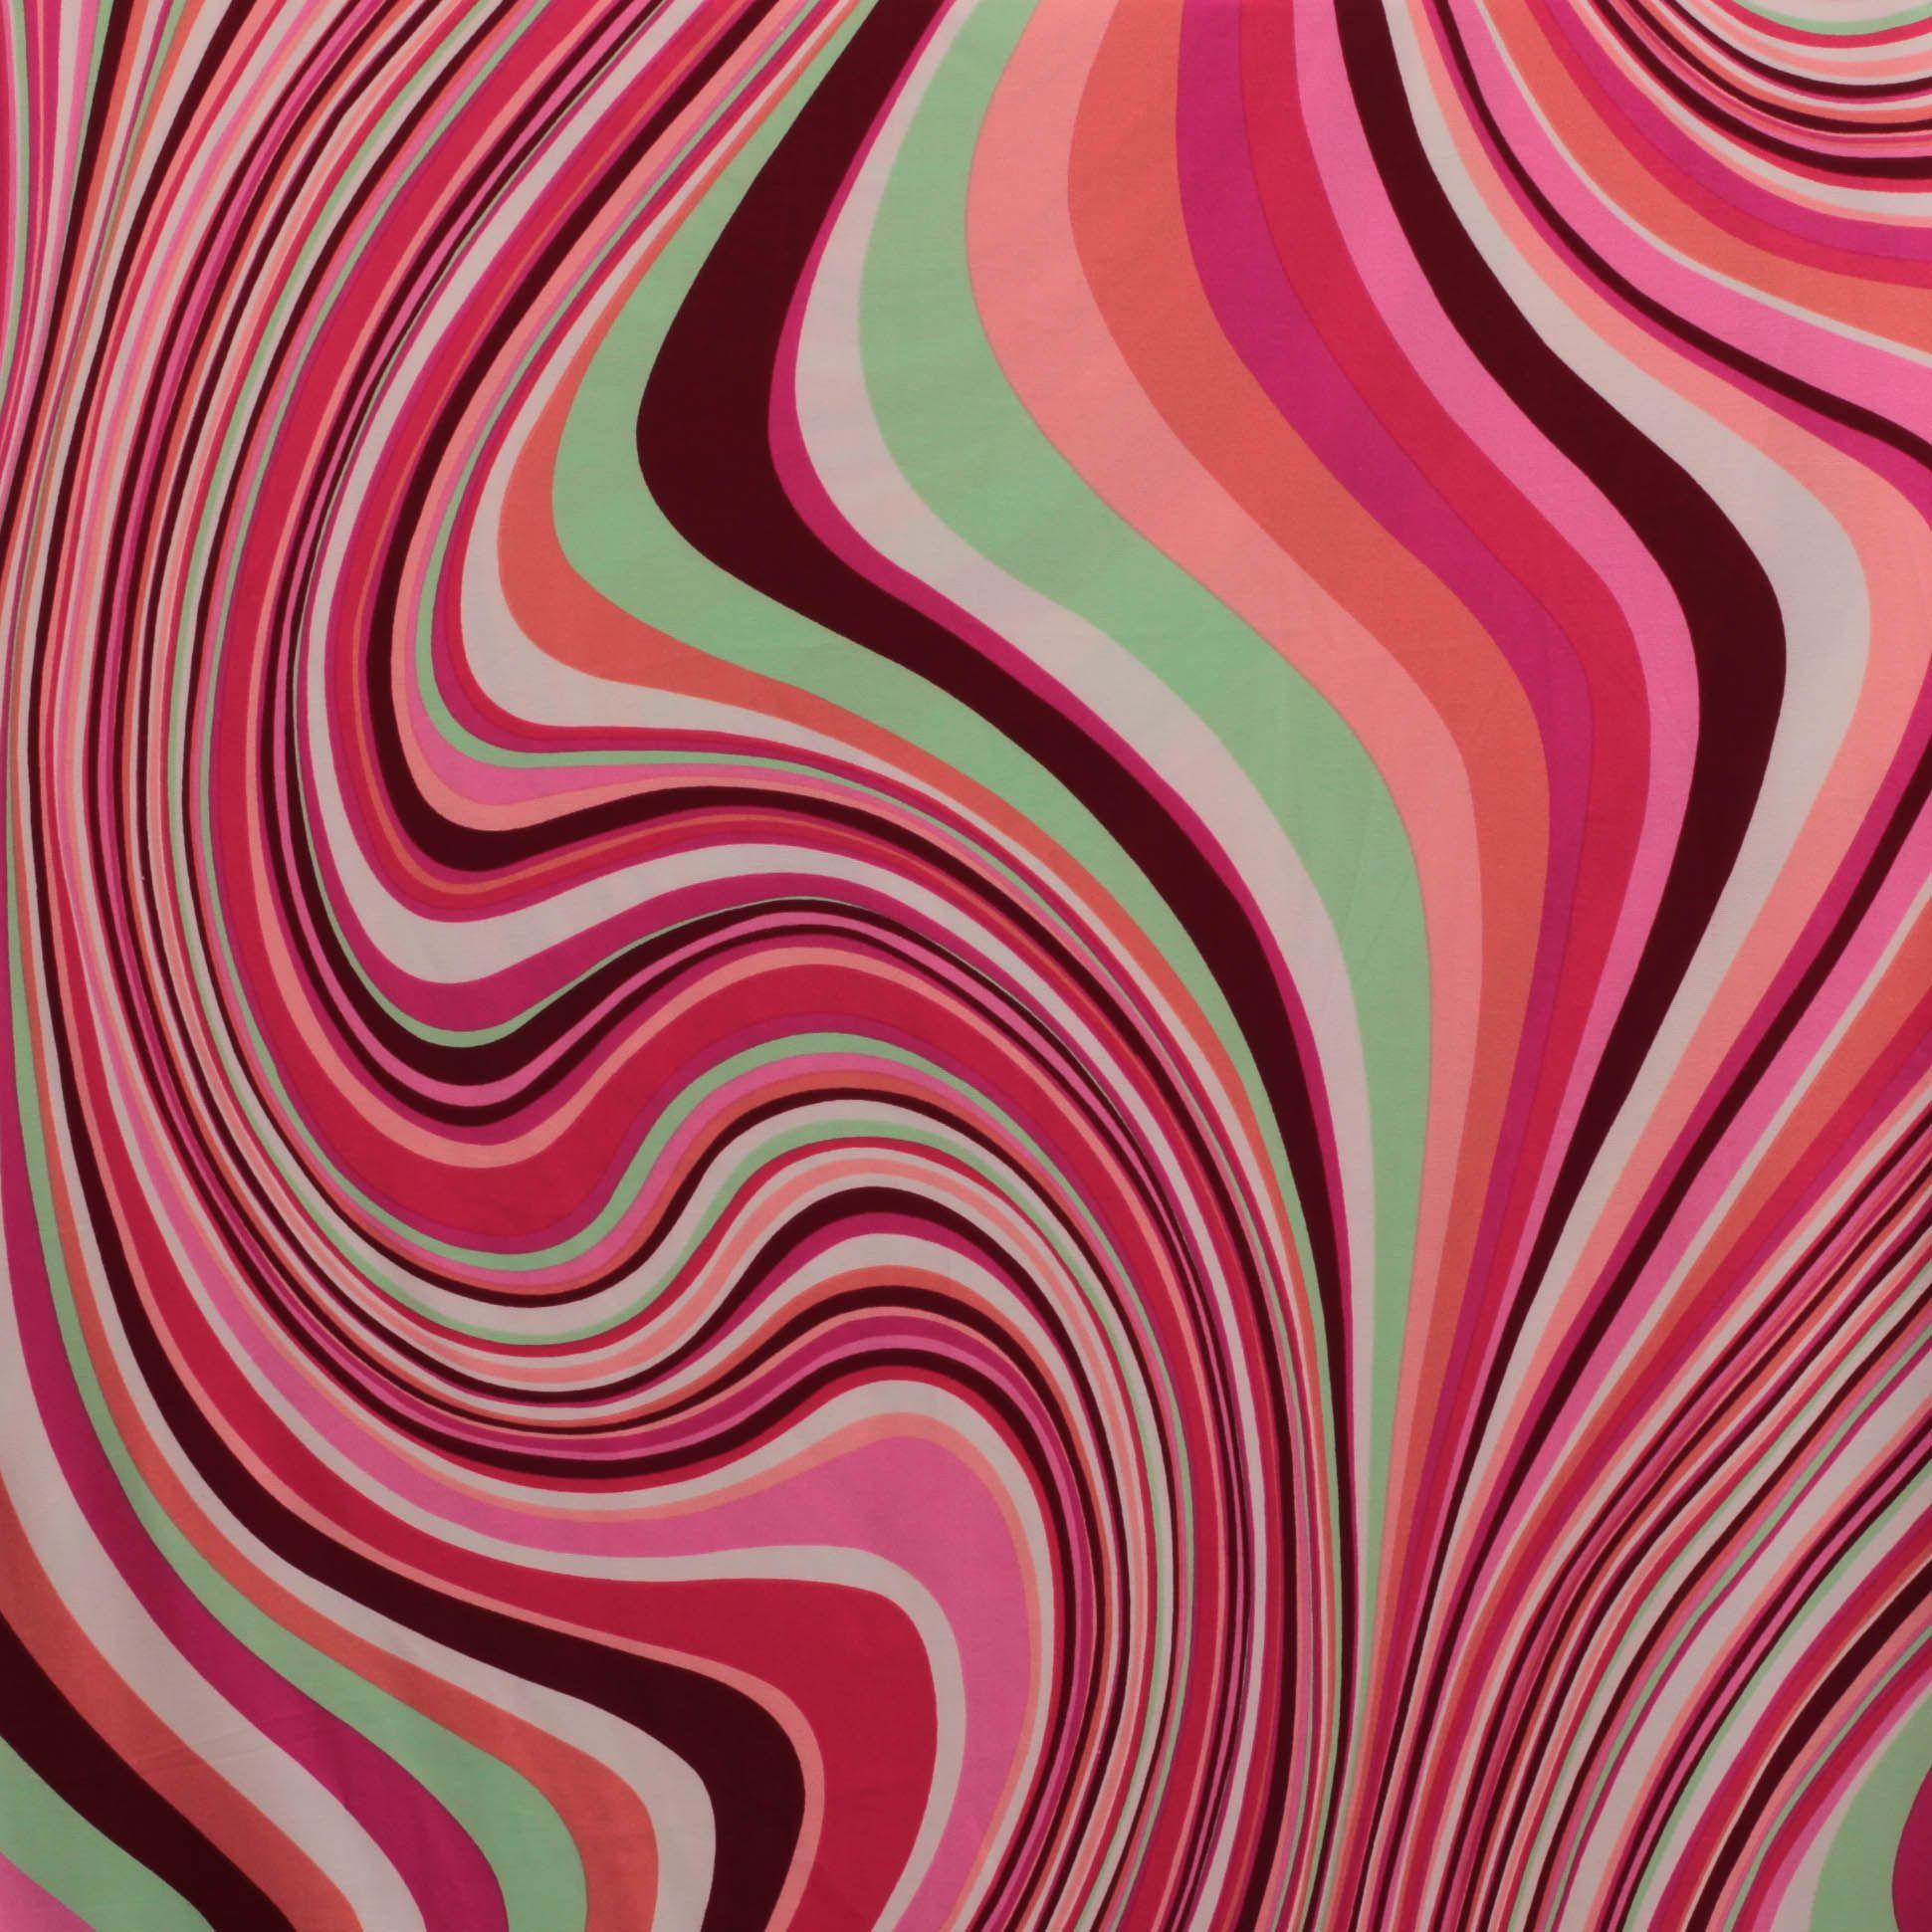 tissus tissu vente en ligne de tissus au m tre pas cher tissus pas cher place des tissus. Black Bedroom Furniture Sets. Home Design Ideas